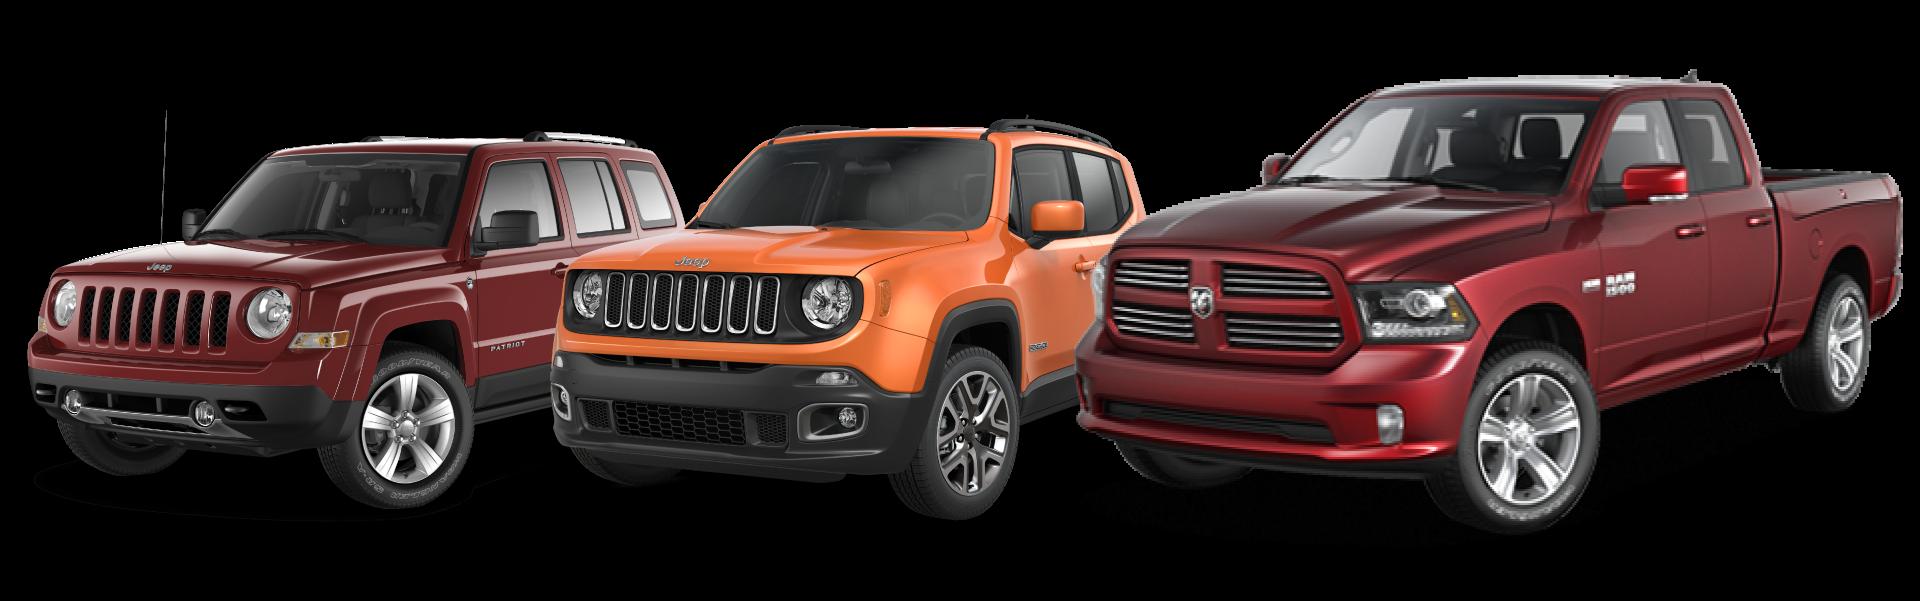 Affiliate Rewards Program Anchorage Chrysler Dodge Jeep RAM Center - Chrysler affiliates list